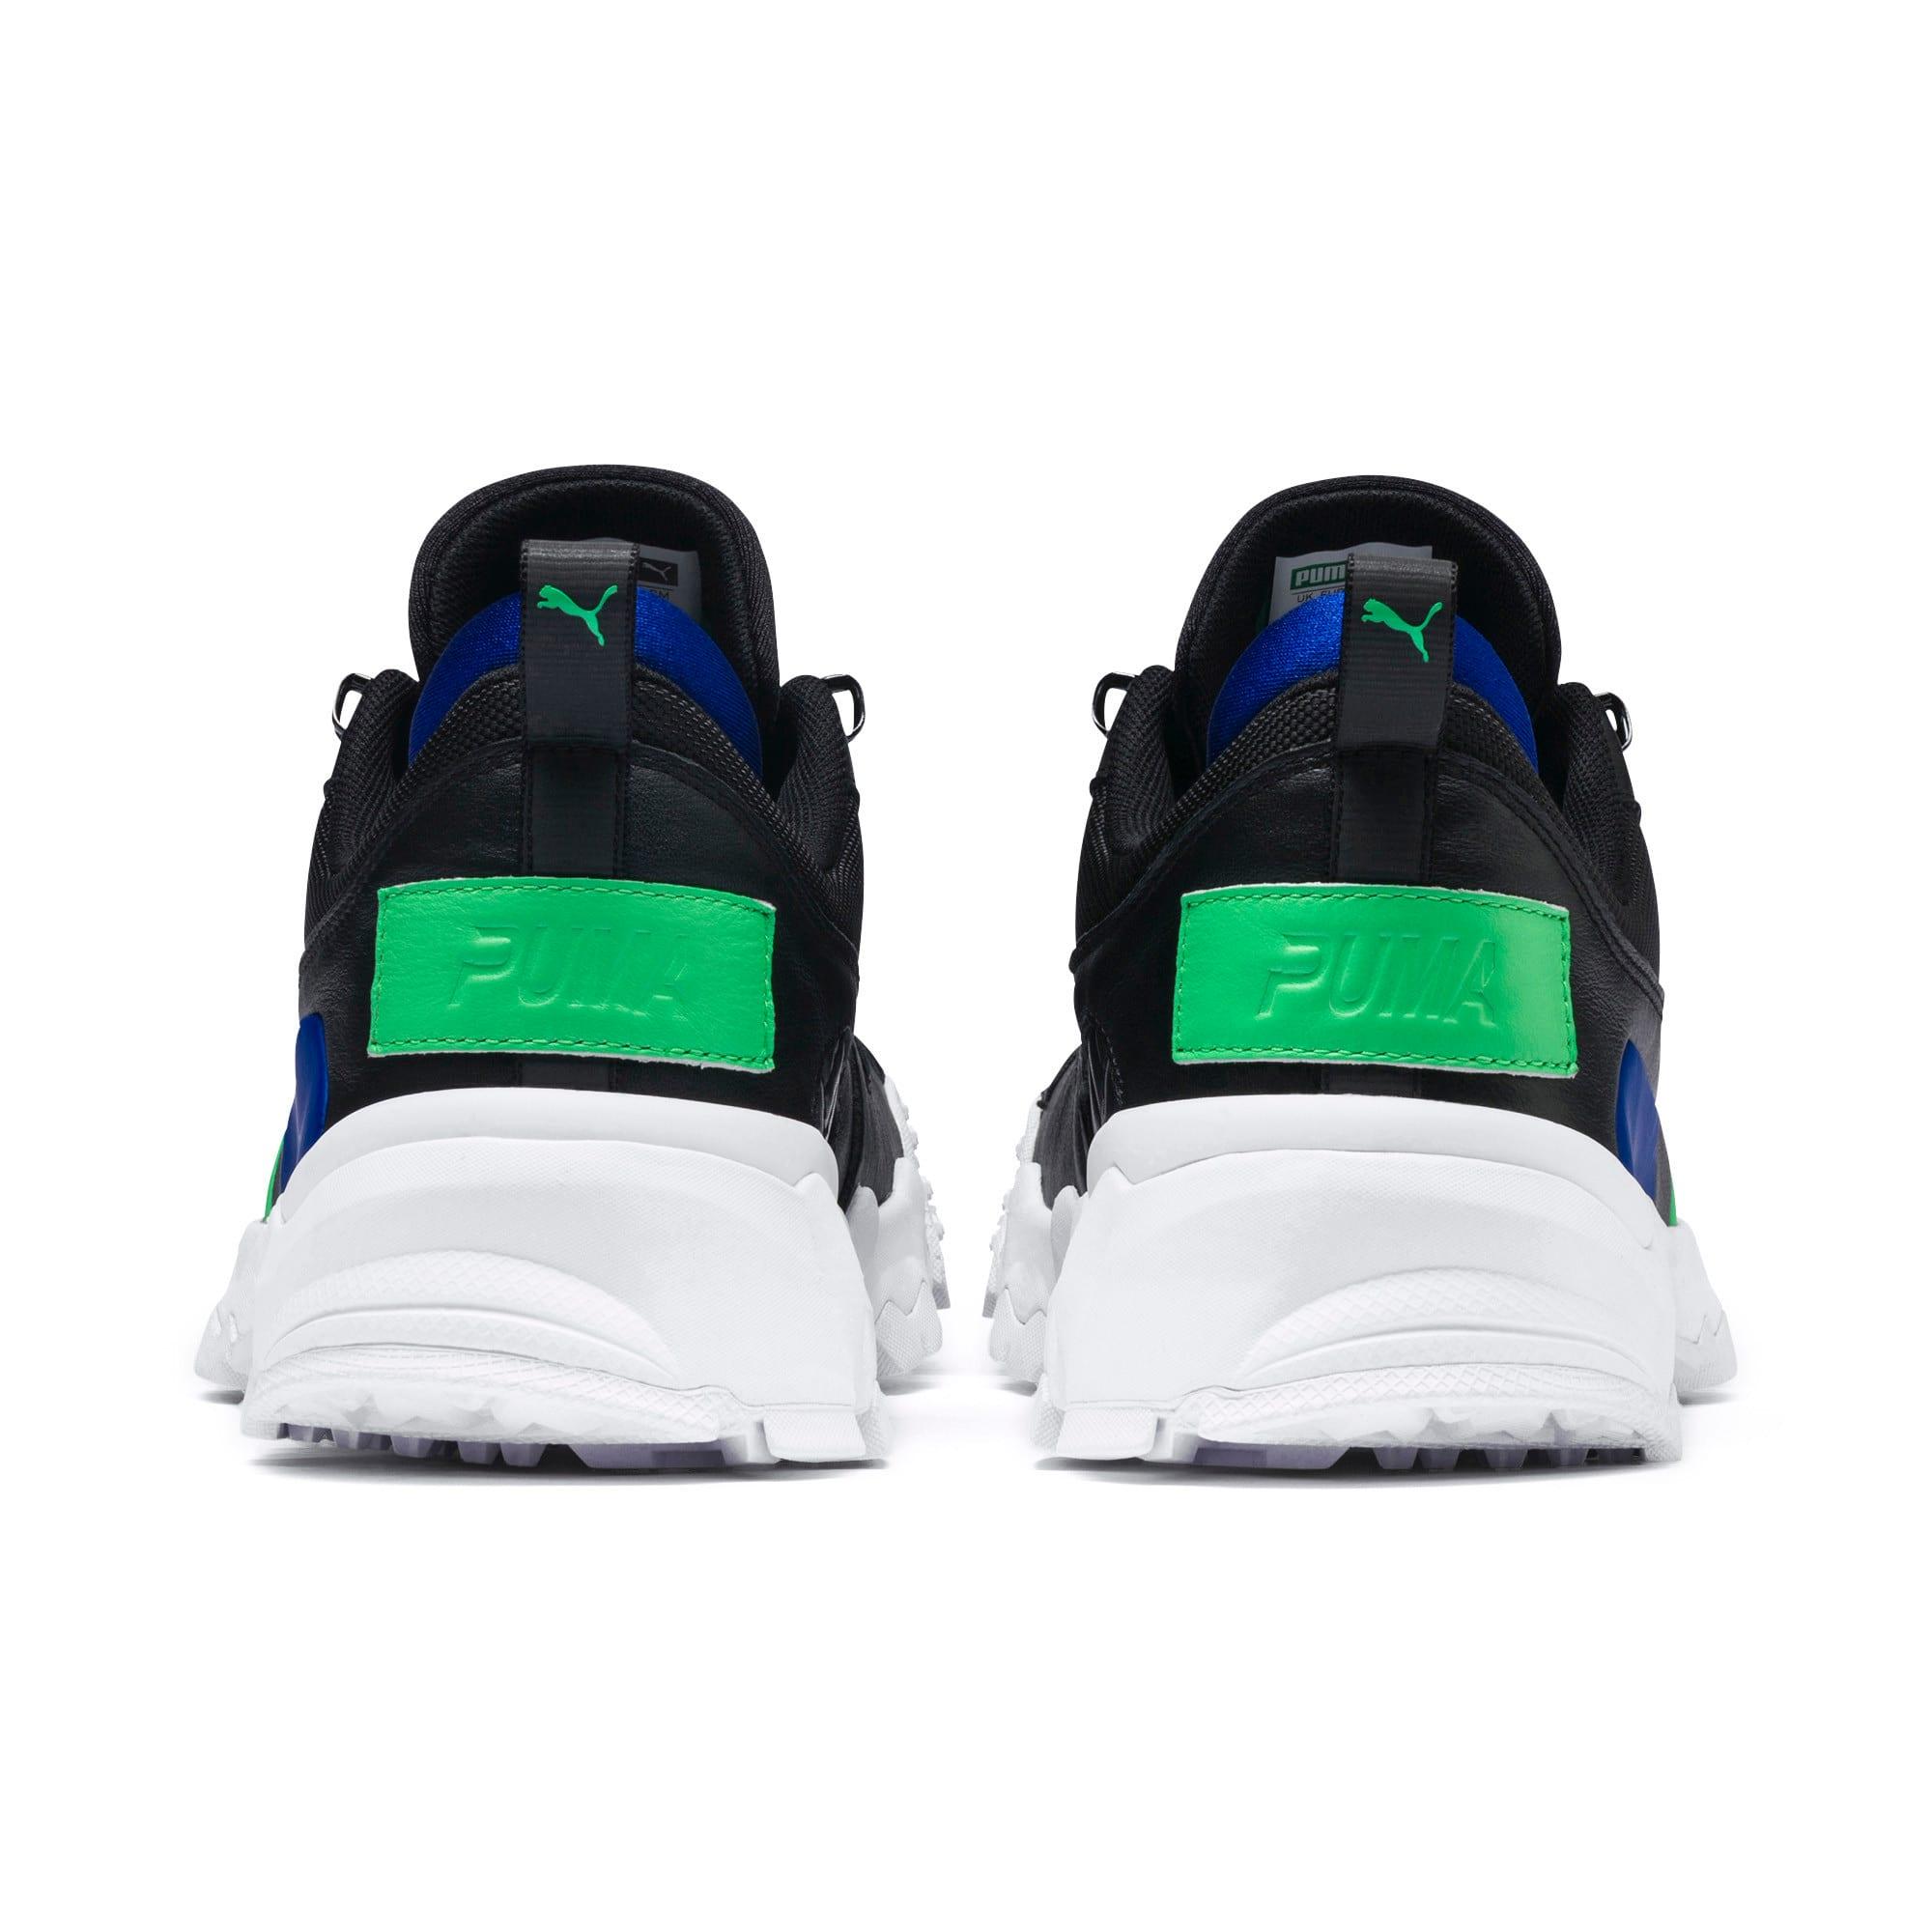 Thumbnail 4 of Trailfox Leather Sneakers, Puma Black-Irish Green, medium